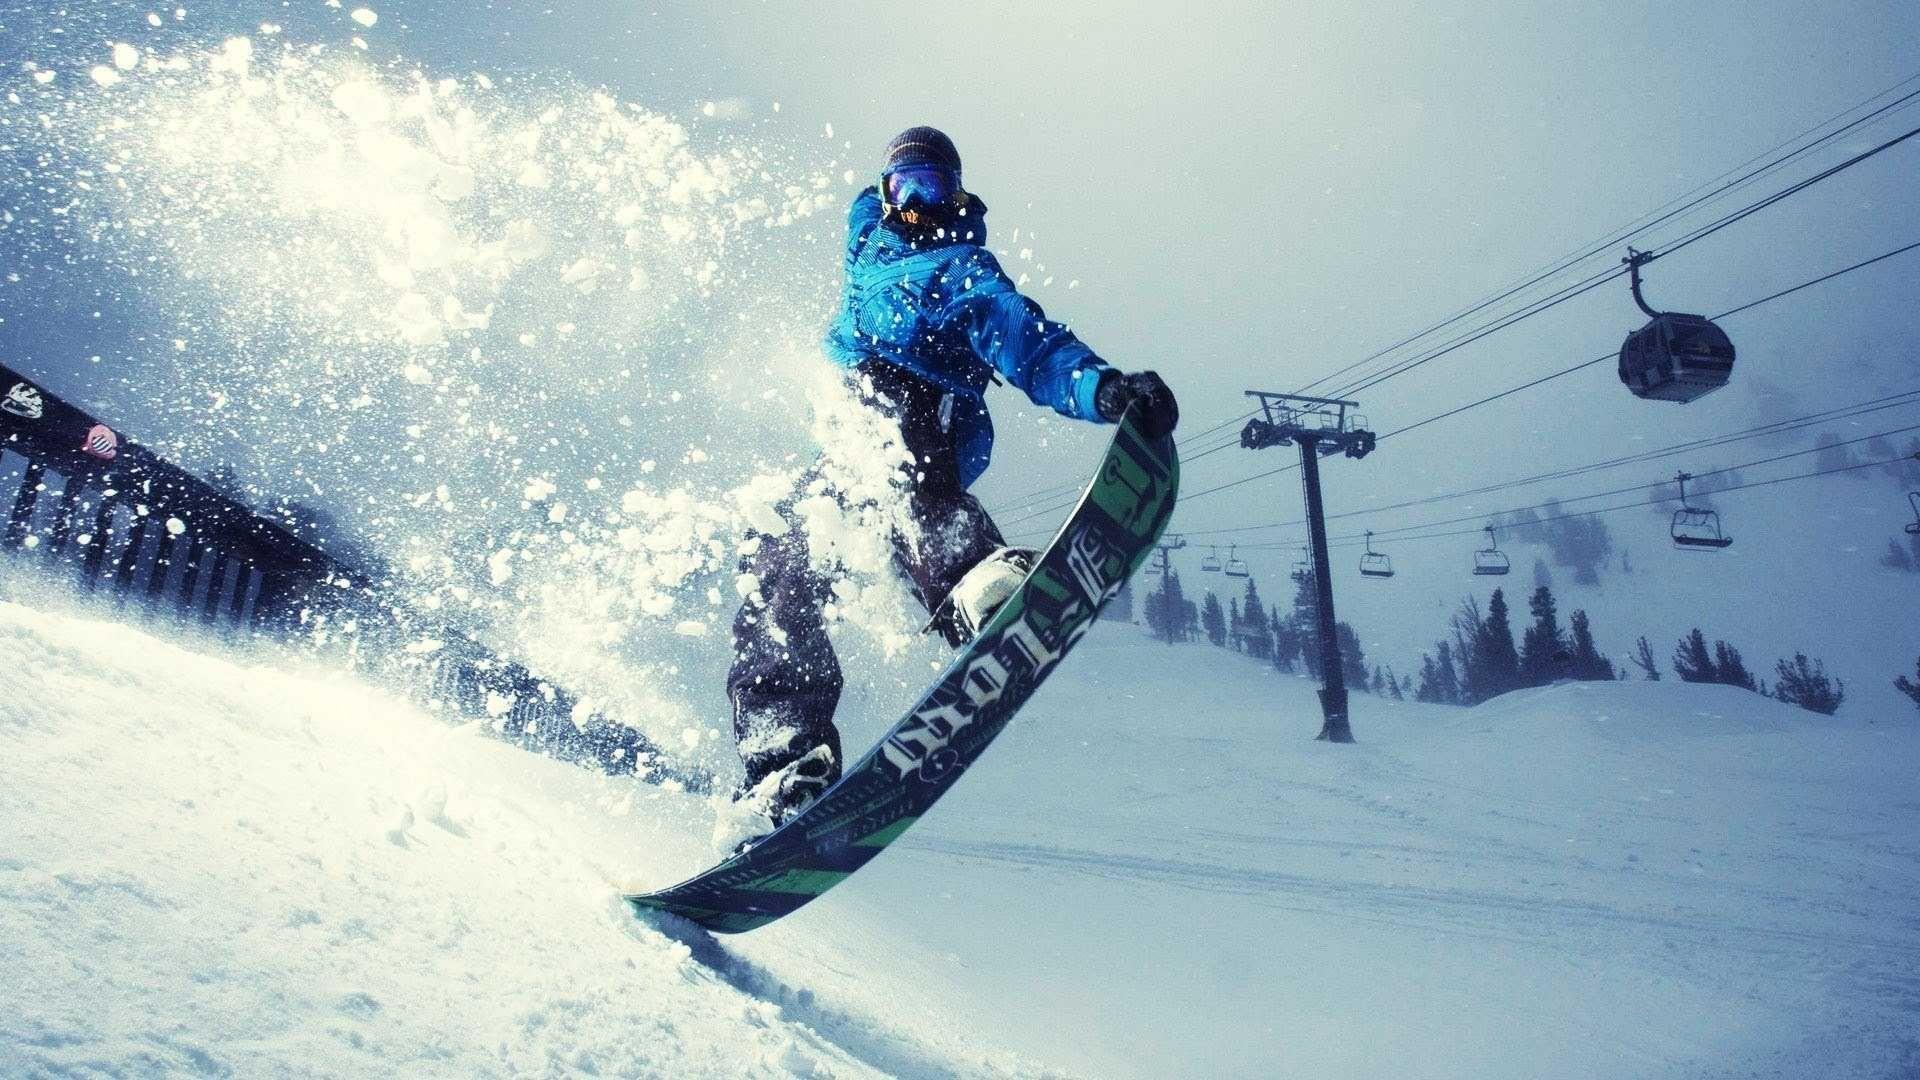 Snowboard Time Beautiful Winter Sport Snowboard Snowboarding Winter Sports